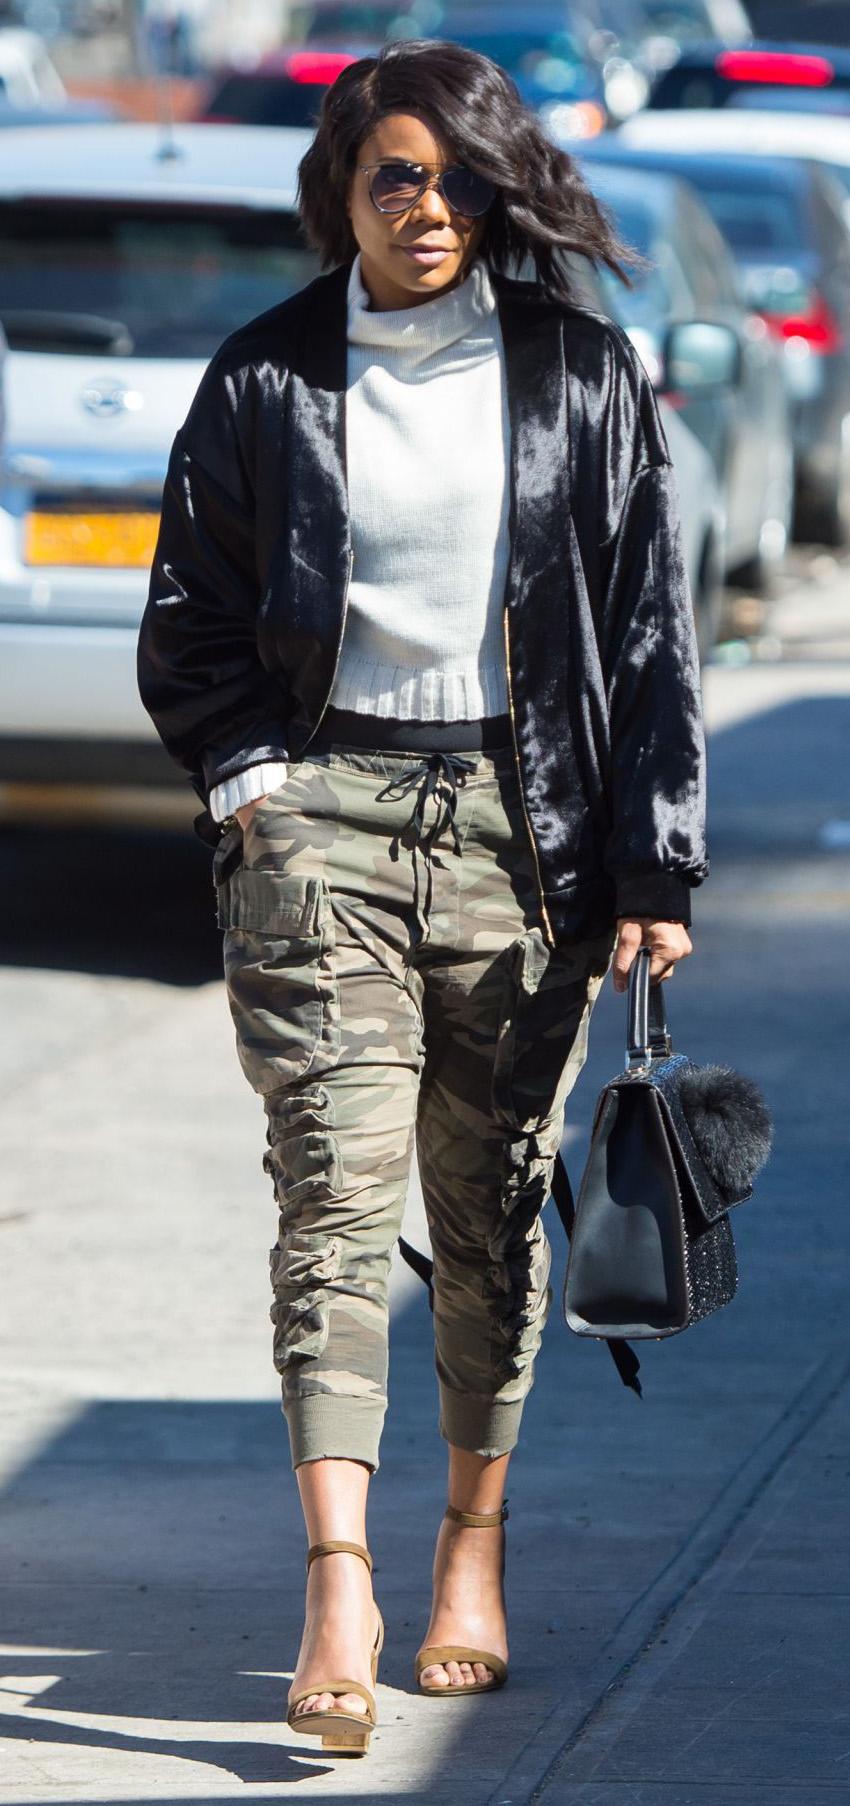 key-natural-sporty-style-type-gabrielleunion-cargo-army-camo-joggers-harem-sweater-black-jacket-sandals-street.jpg